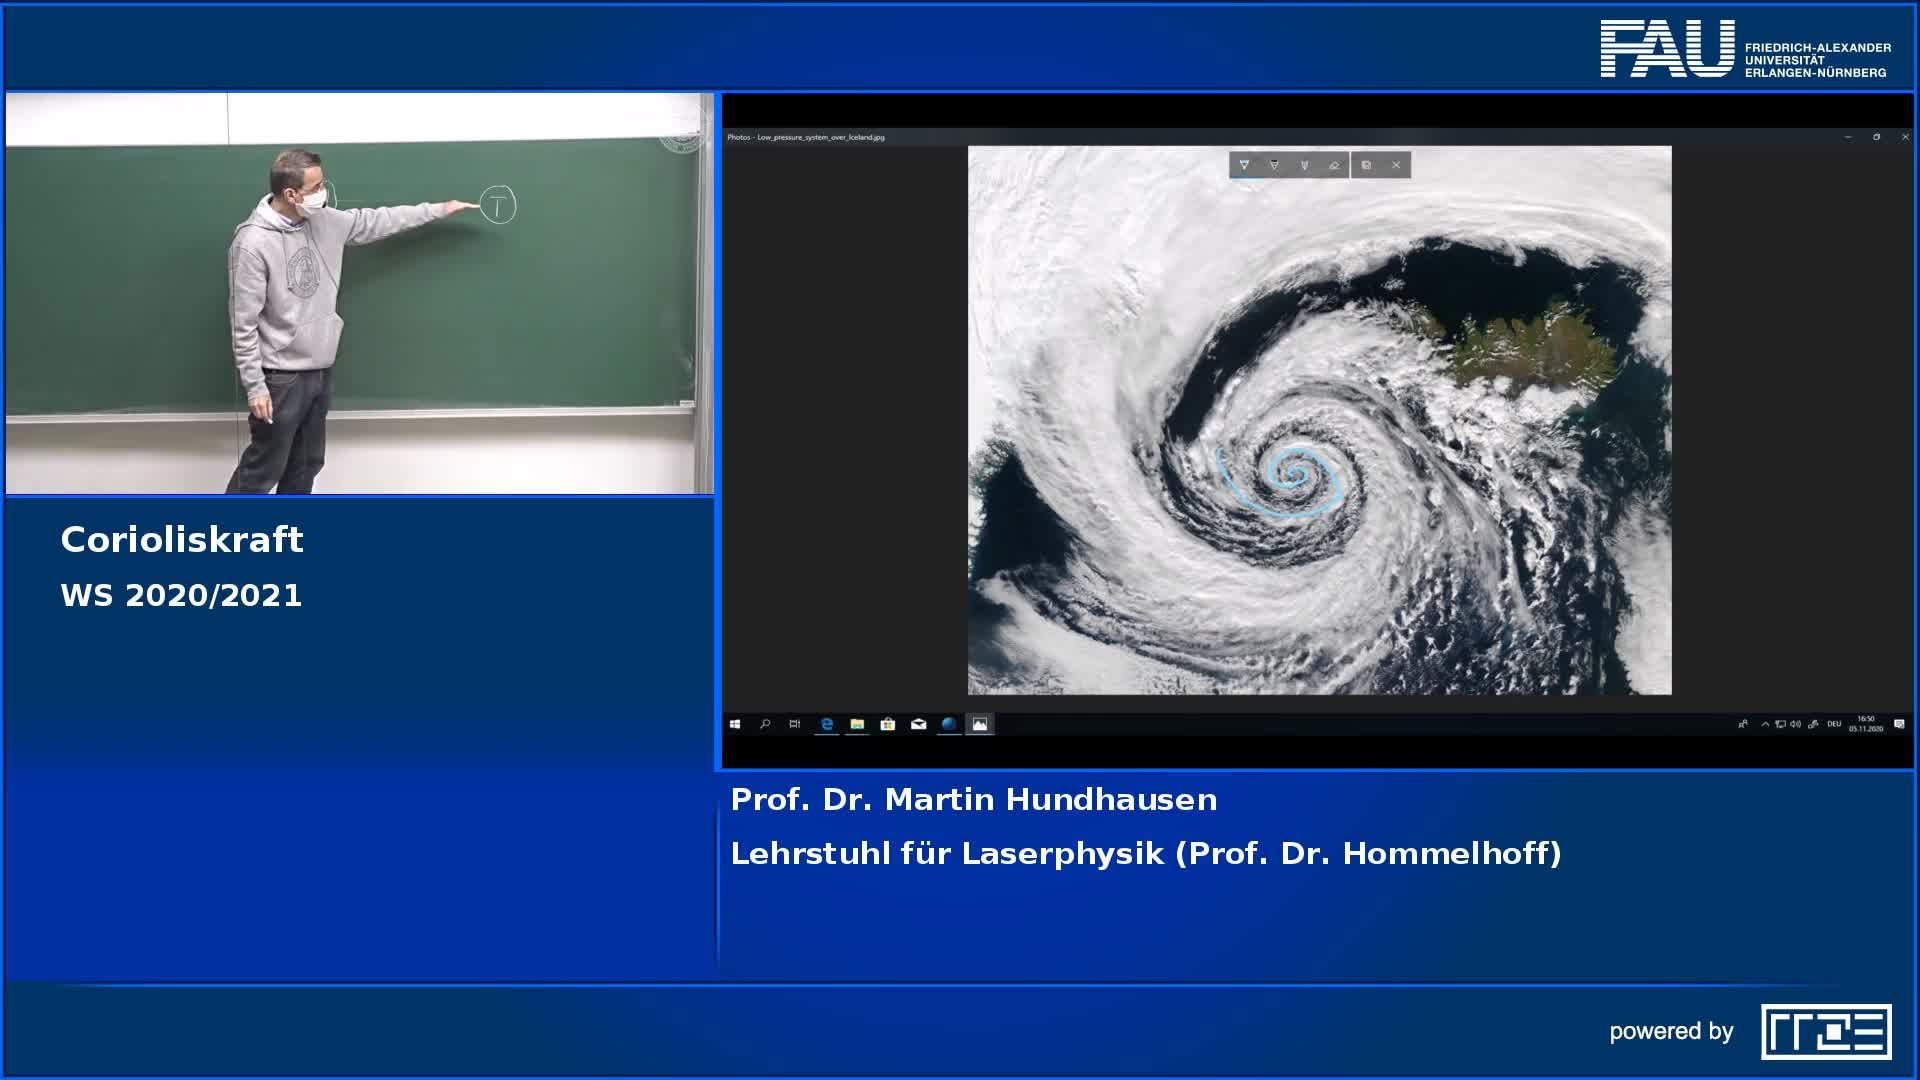 Corioliskraft preview image